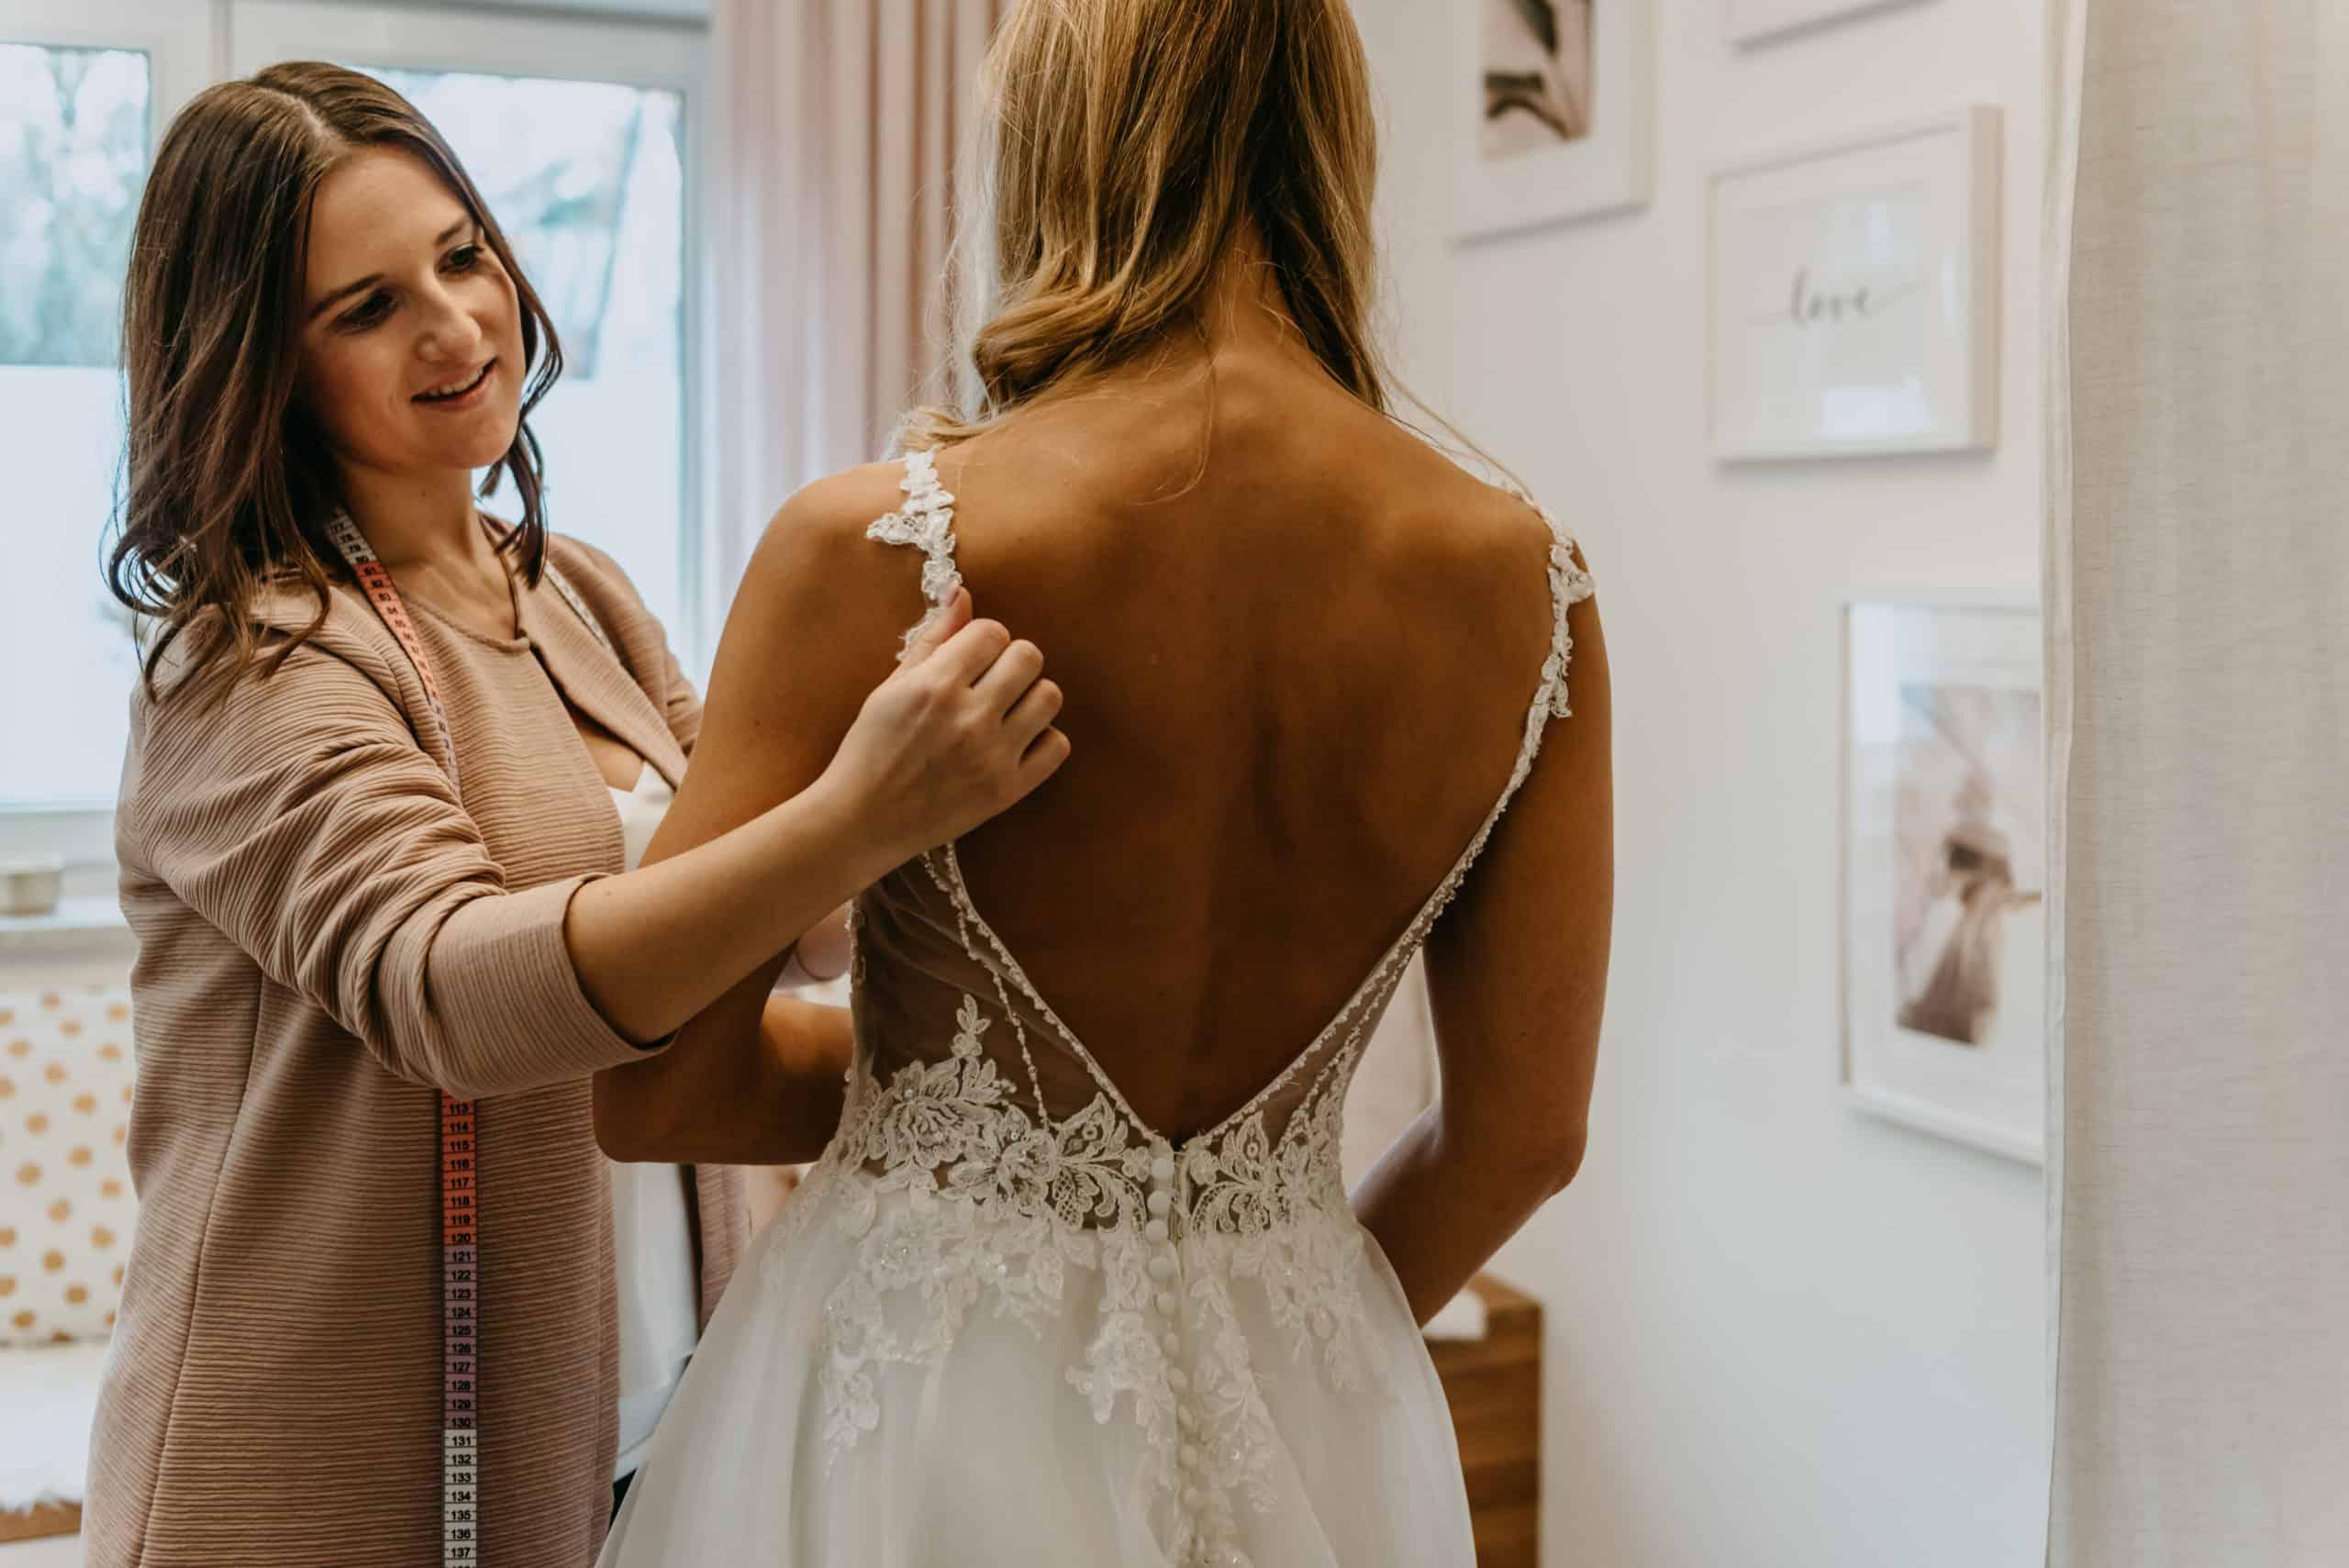 Brautmoden-Regensburg-Second-Hand-Brautkleid-DreamOnDresses- Bridal-Concept-Store-Beratung